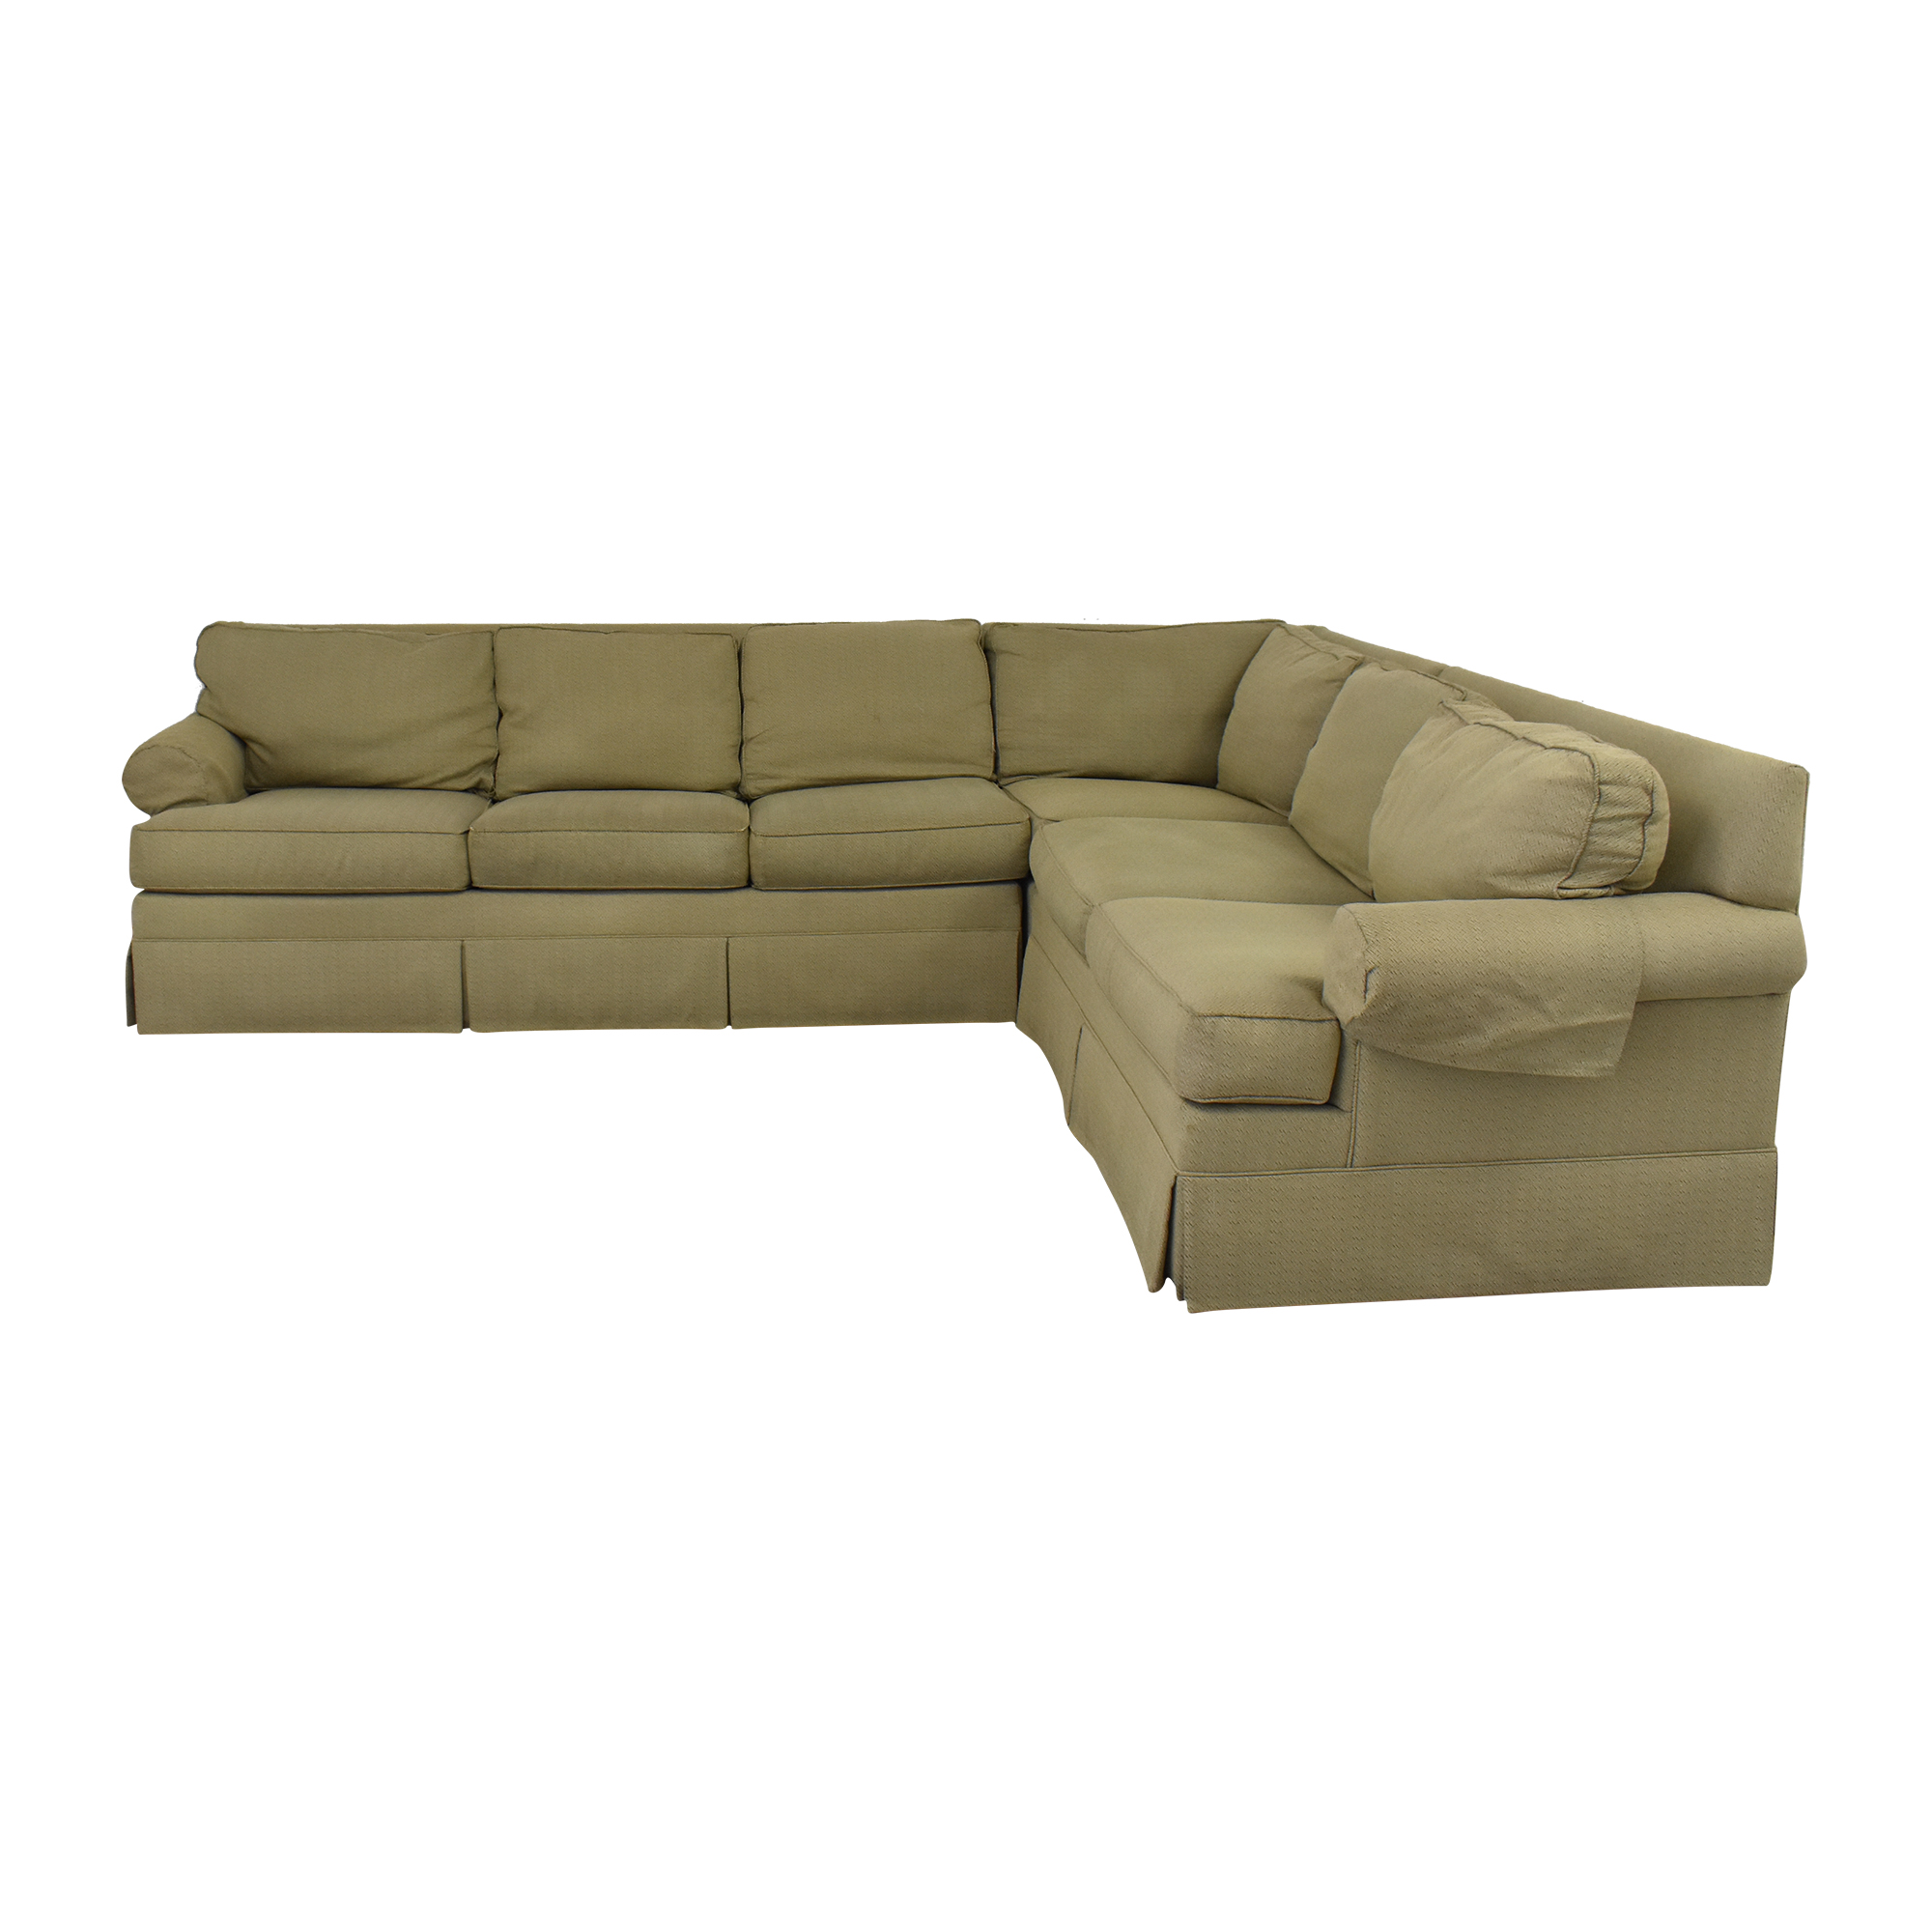 Ethan Allen Ethan Allan Skirted Sectional Sofa for sale